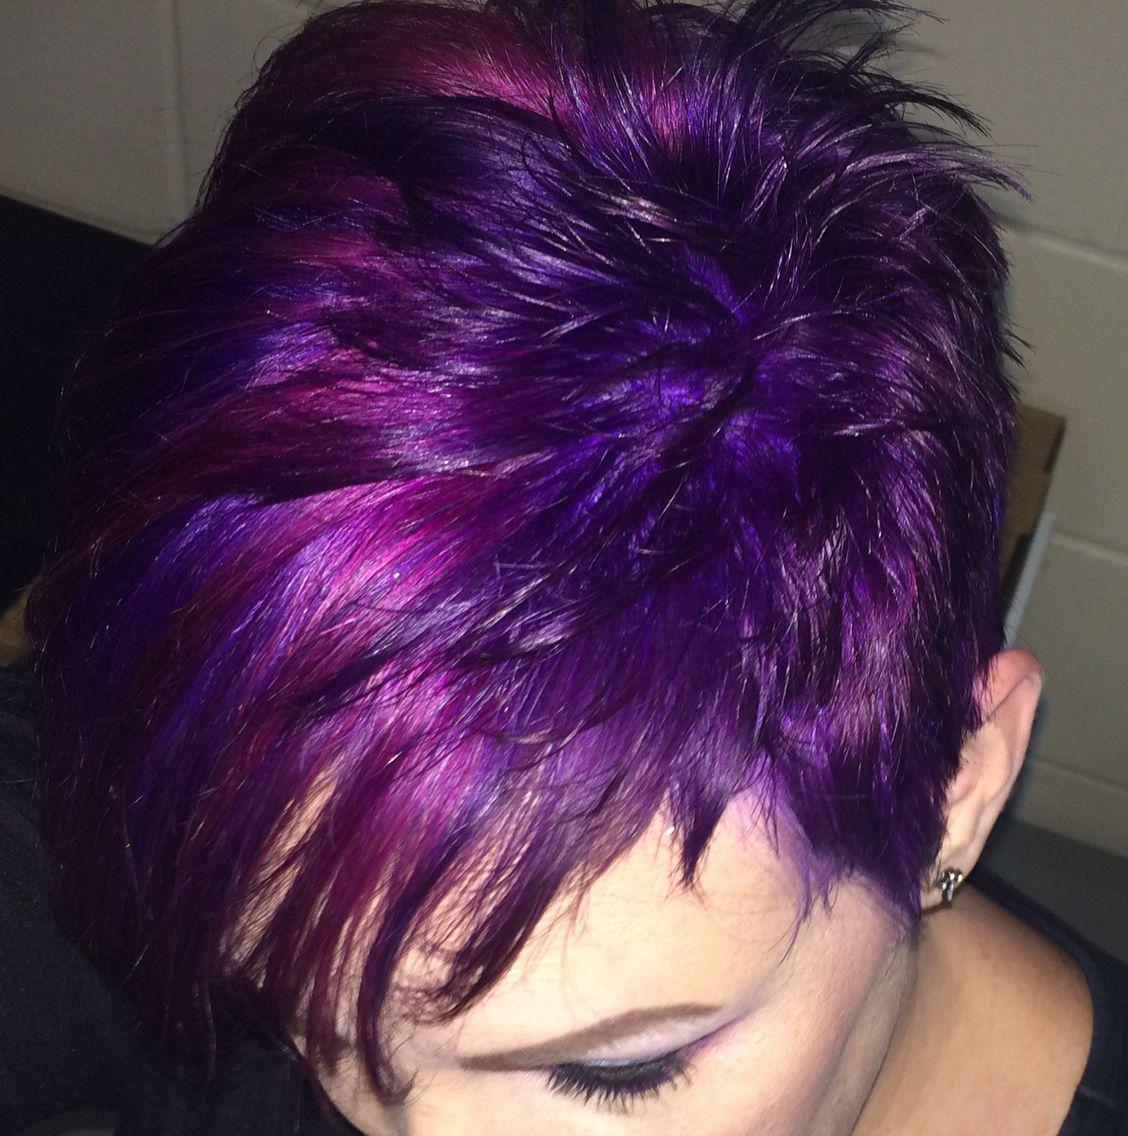 Purple And Pink Short Pixie Hair Short Hair Styles Short Hair Styles Pixie Hair Color Purple